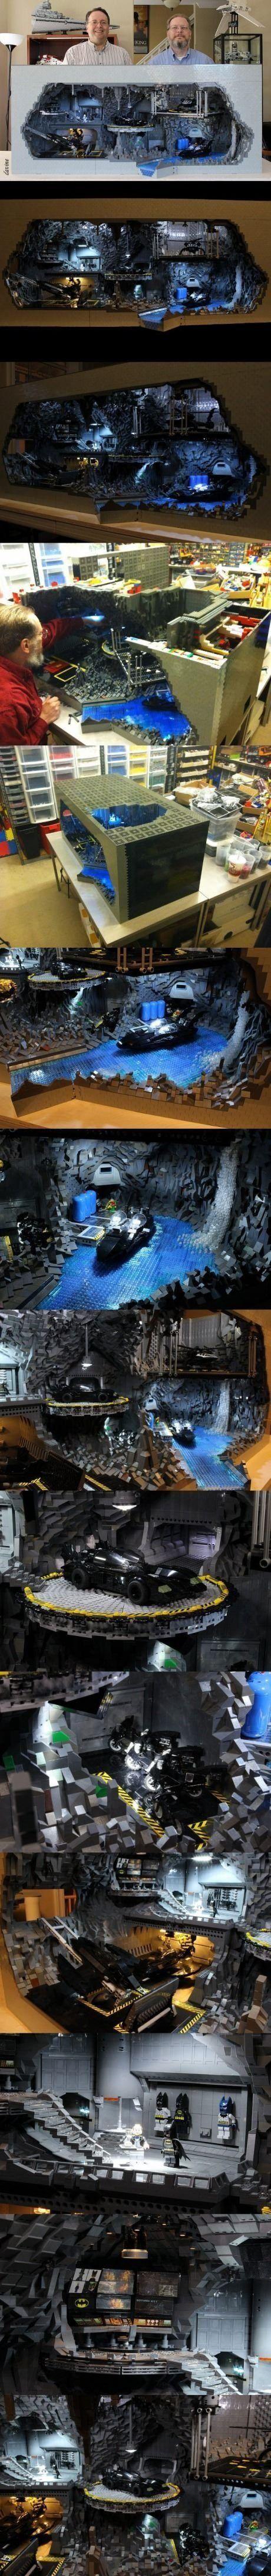 Bathöhle aus 20.000 Legosteinen - Win Bild | Webfail - Fail Bilder und Fail Videos